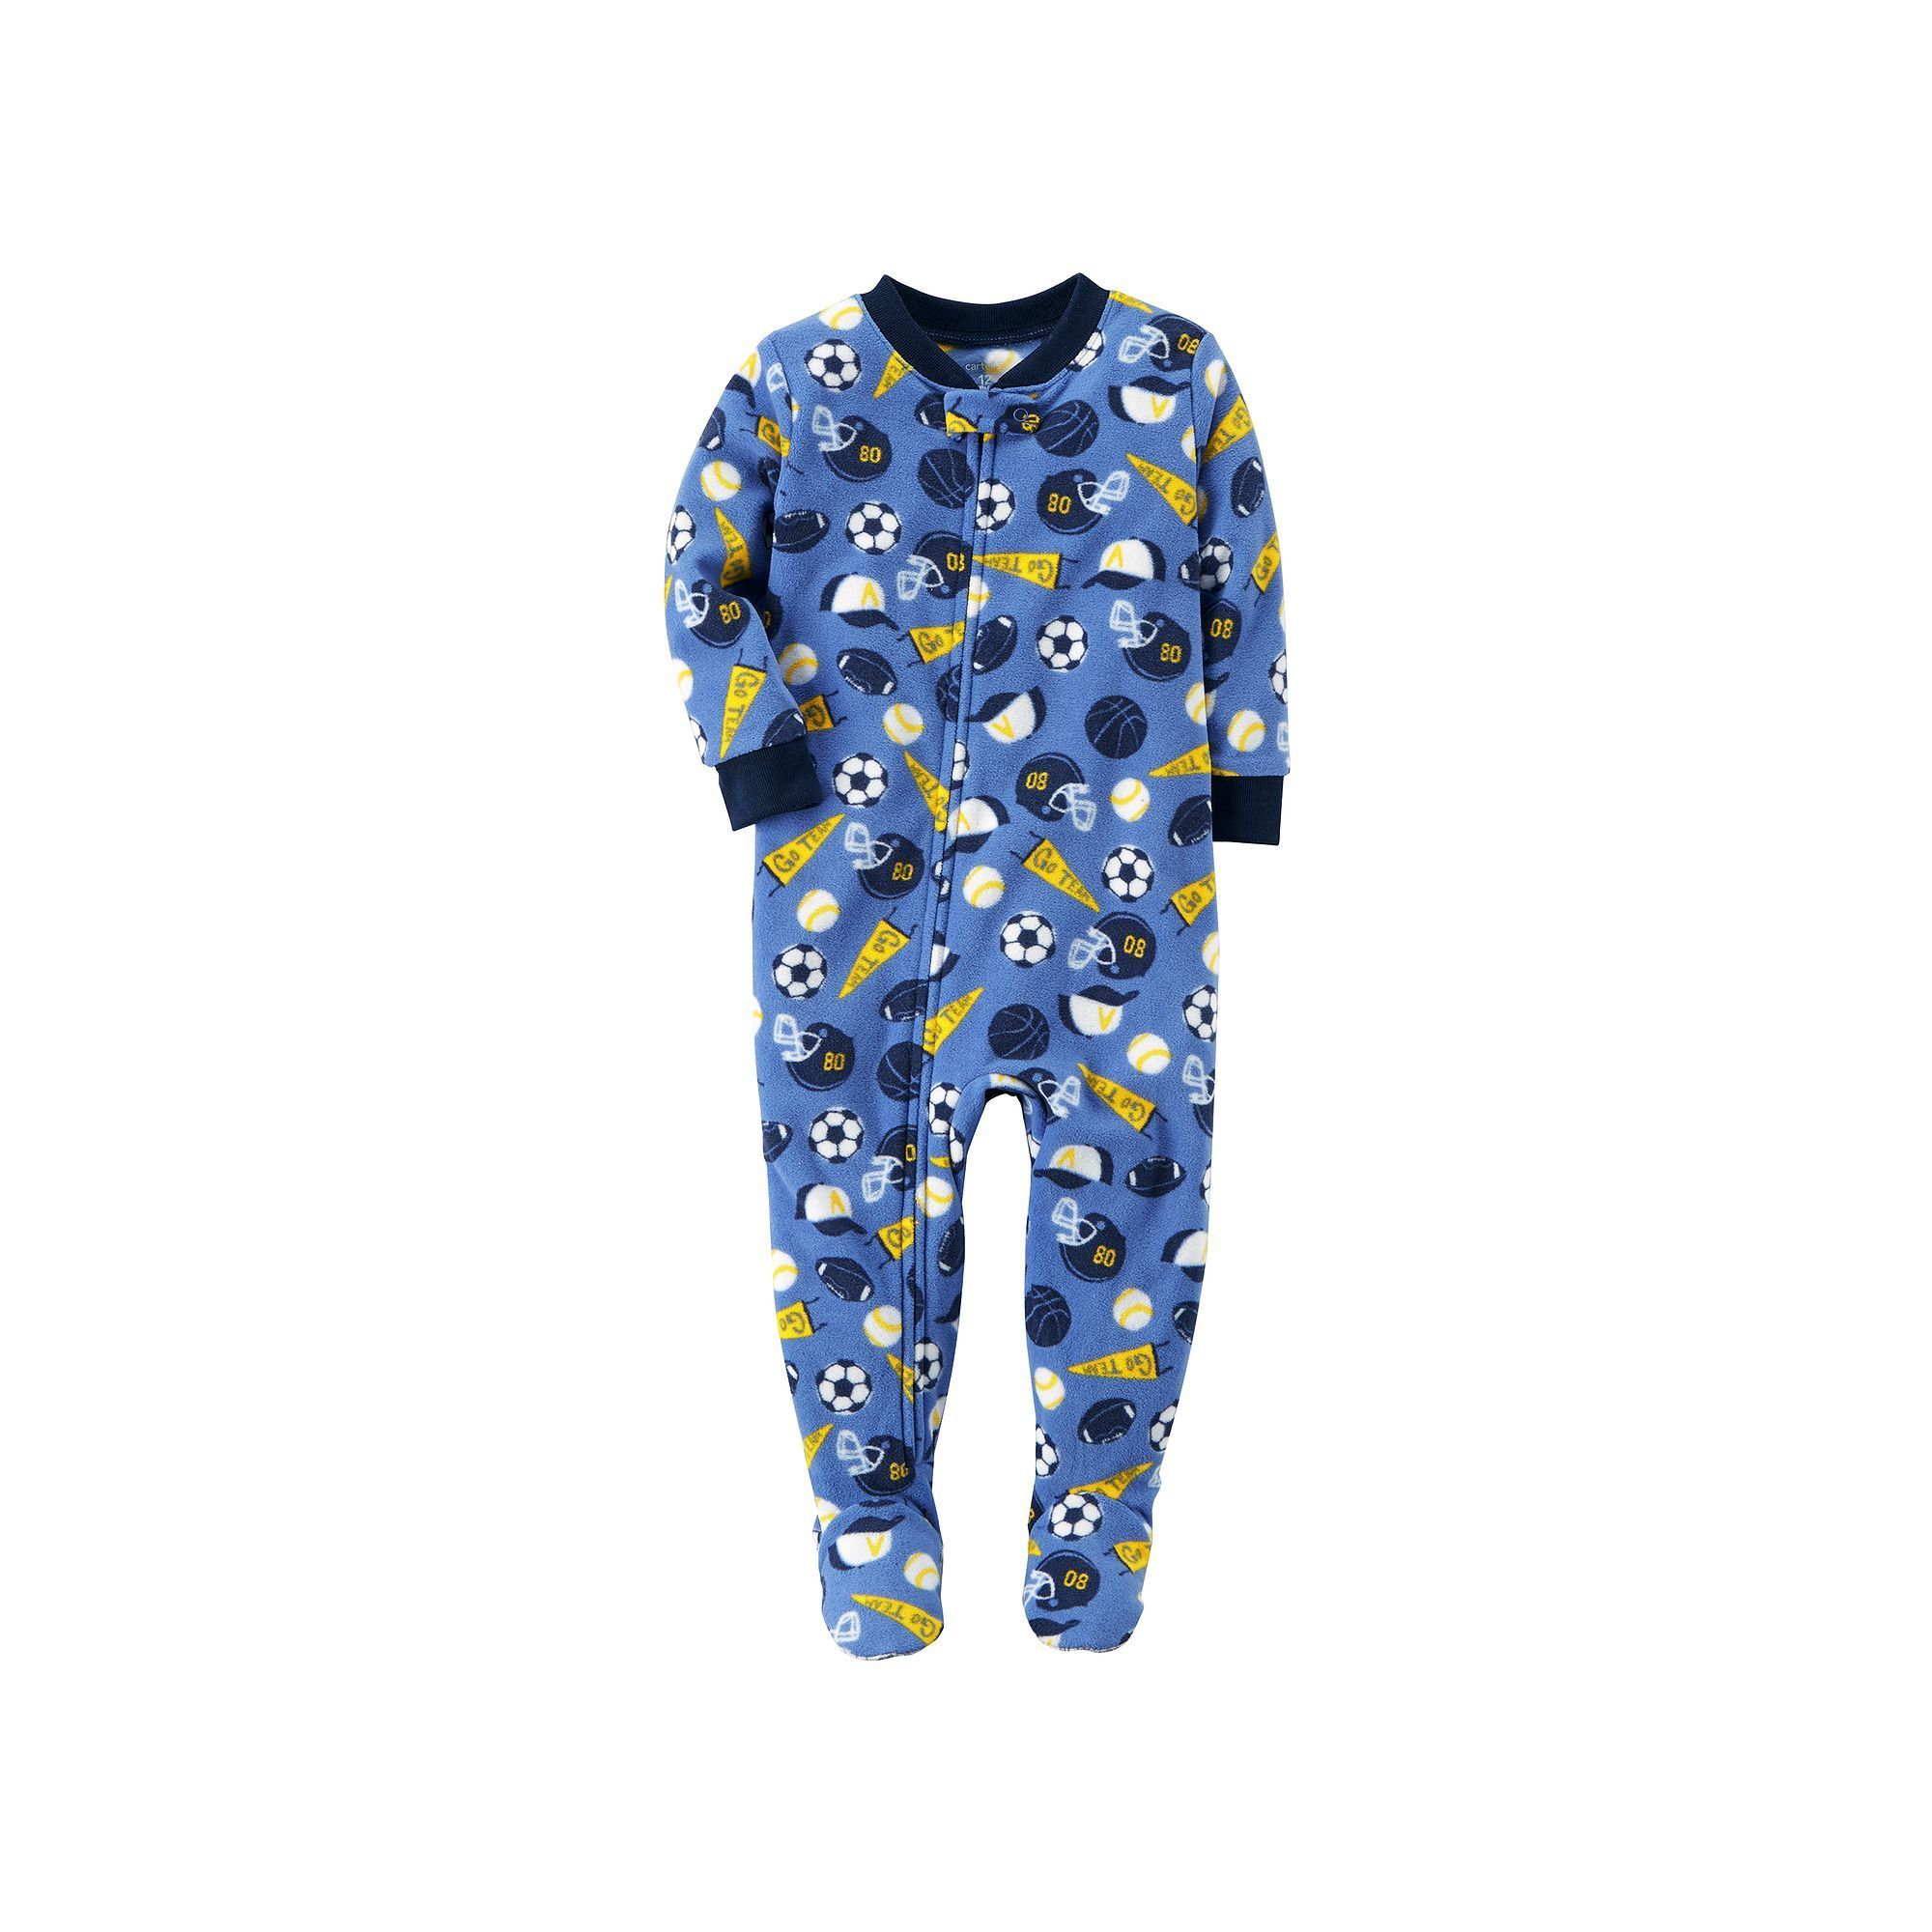 abb56f7c7 Carter s Toddler Boy Sports Fleece Footed Pajamas